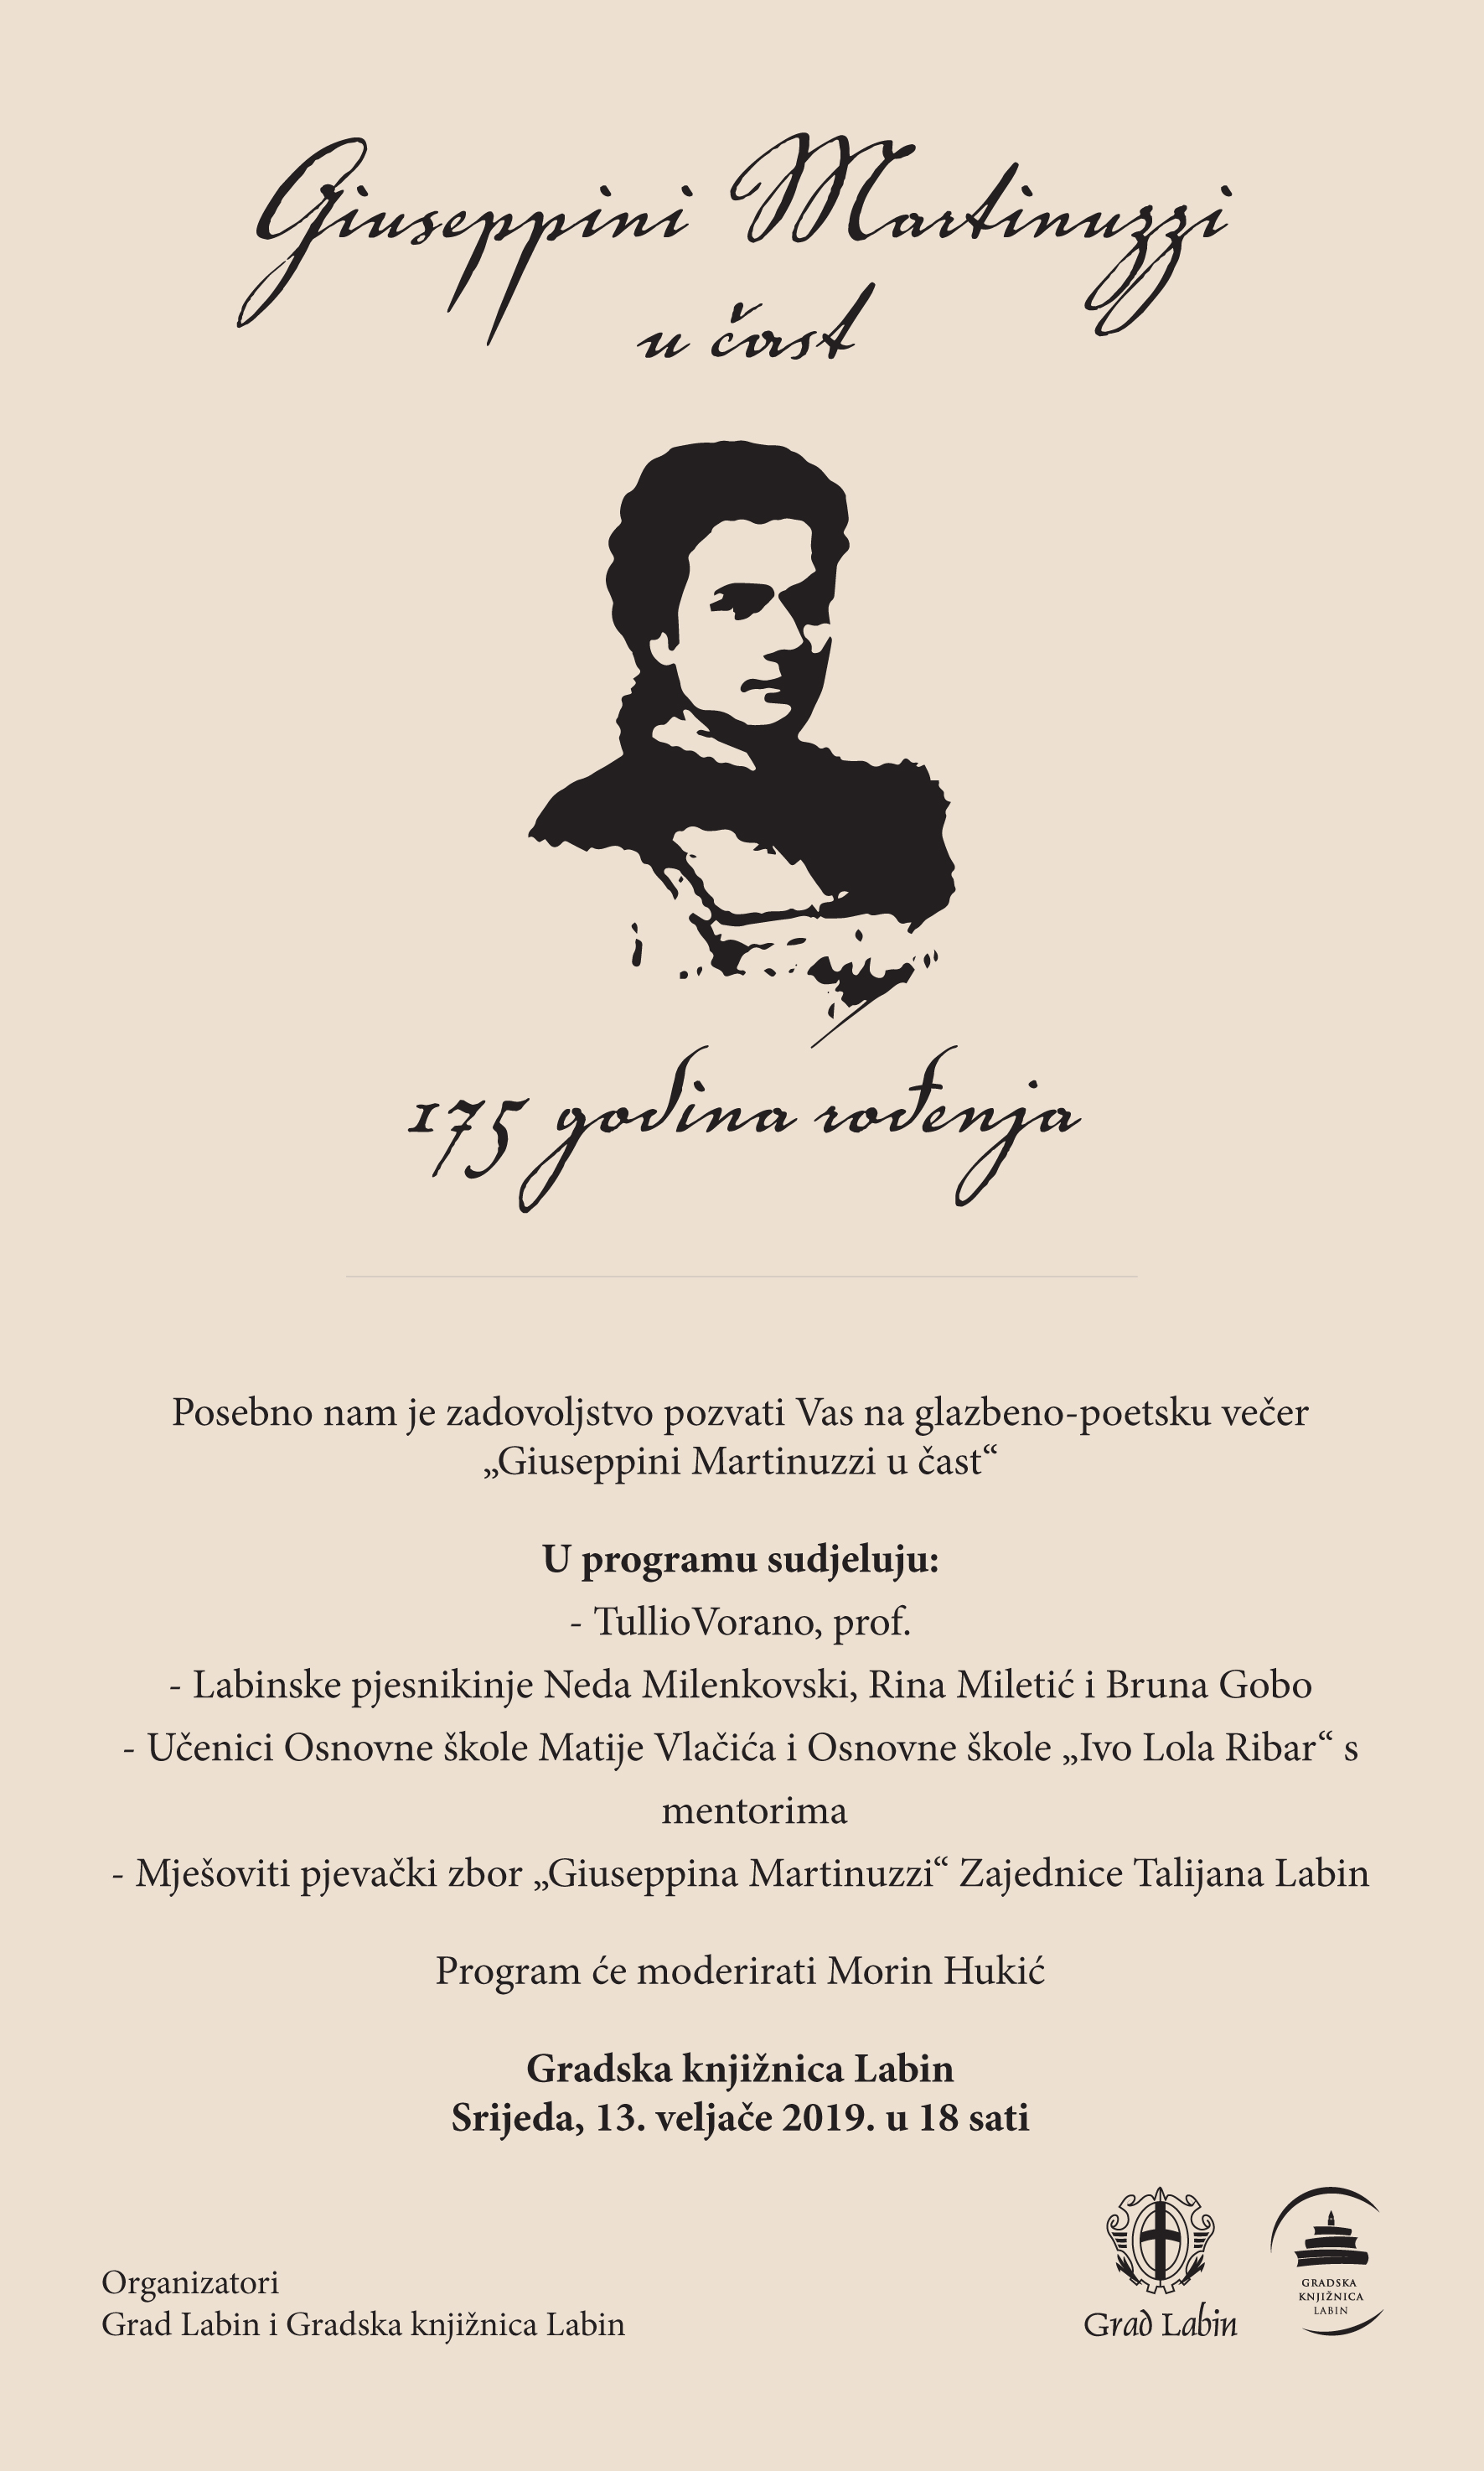 """Giuseppini Martinuzzi u čast"""